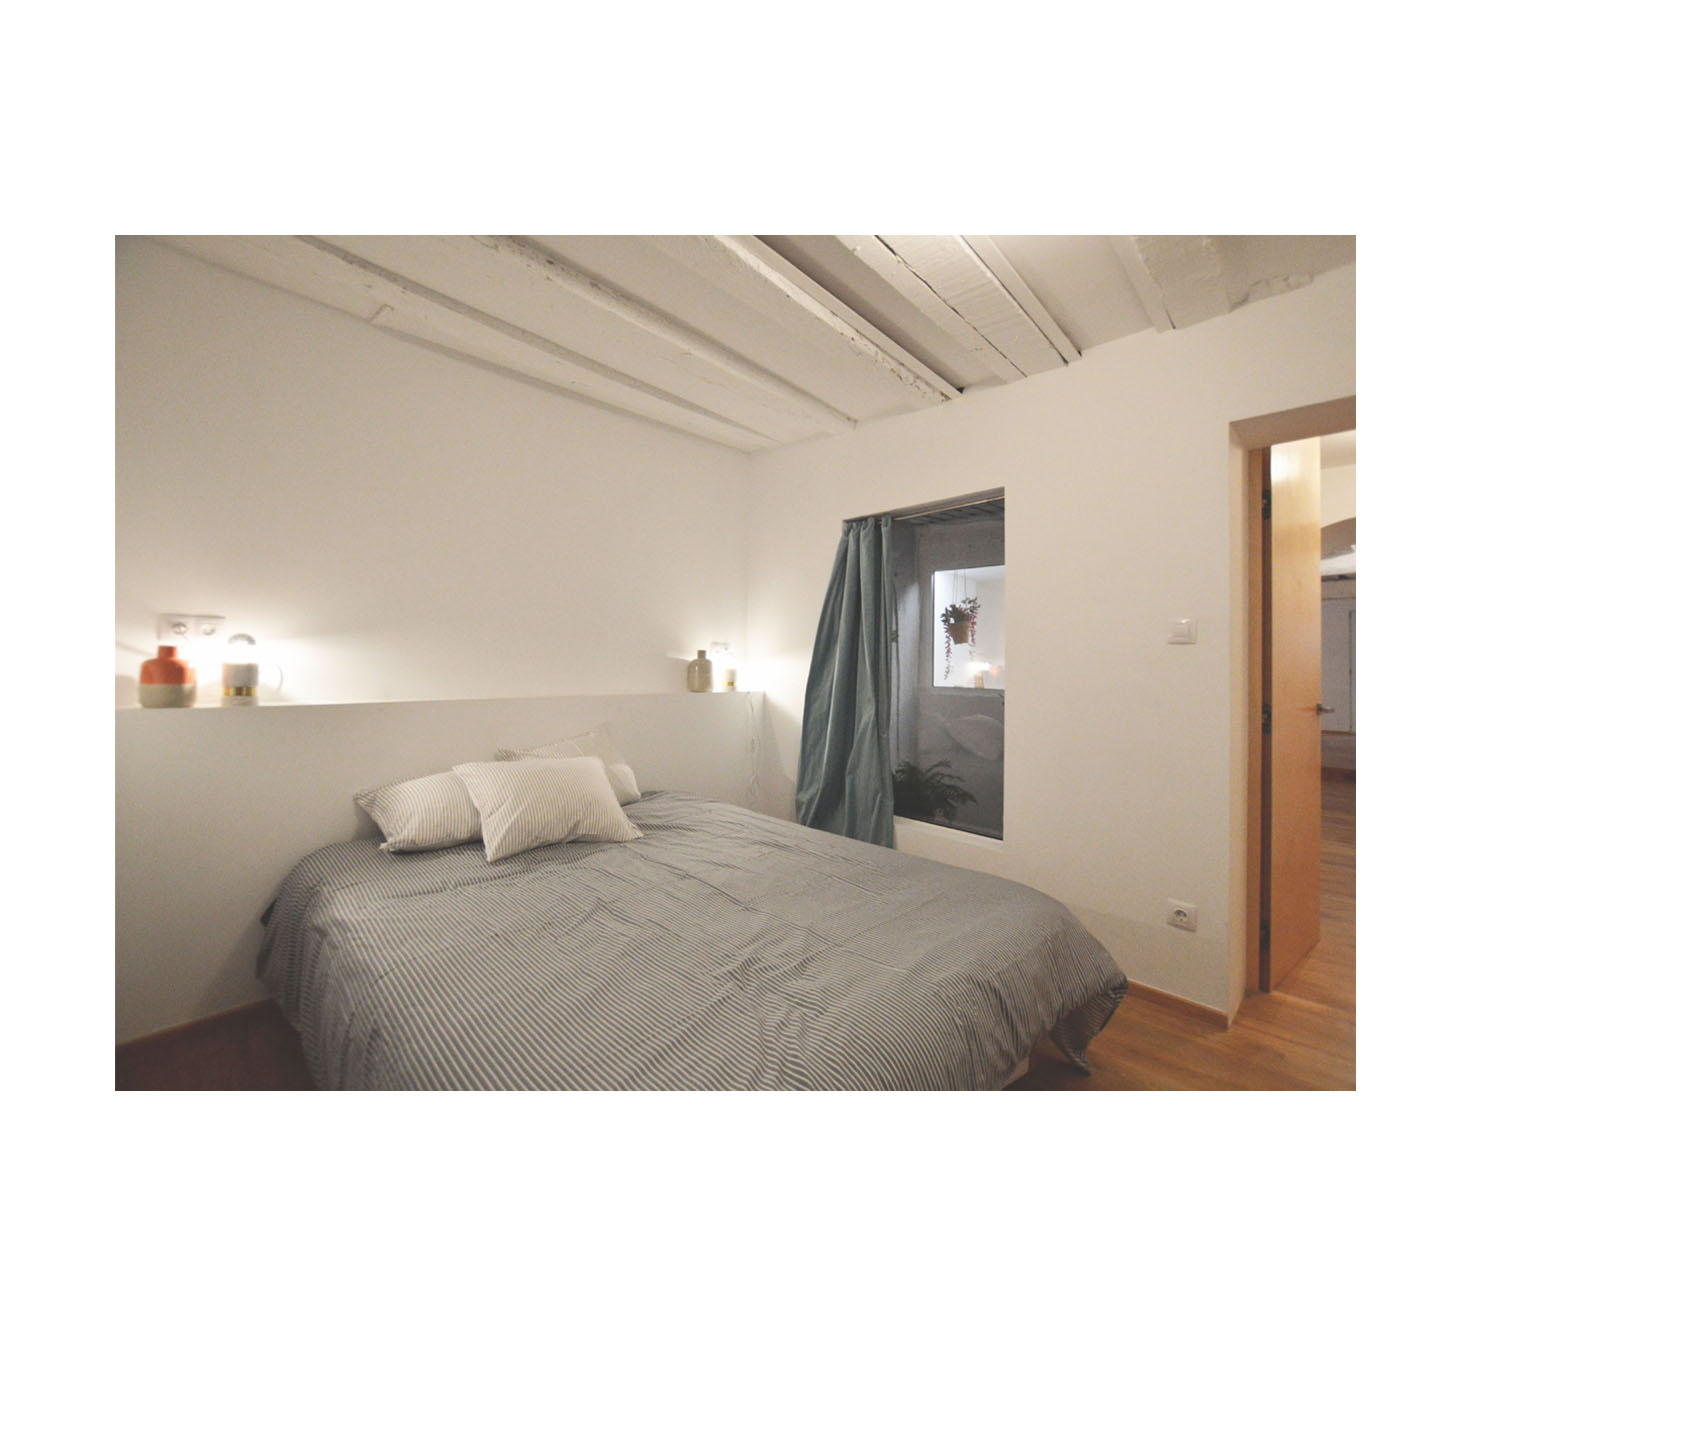 Apartment Artekale-Bilbao-Image 09.jpg